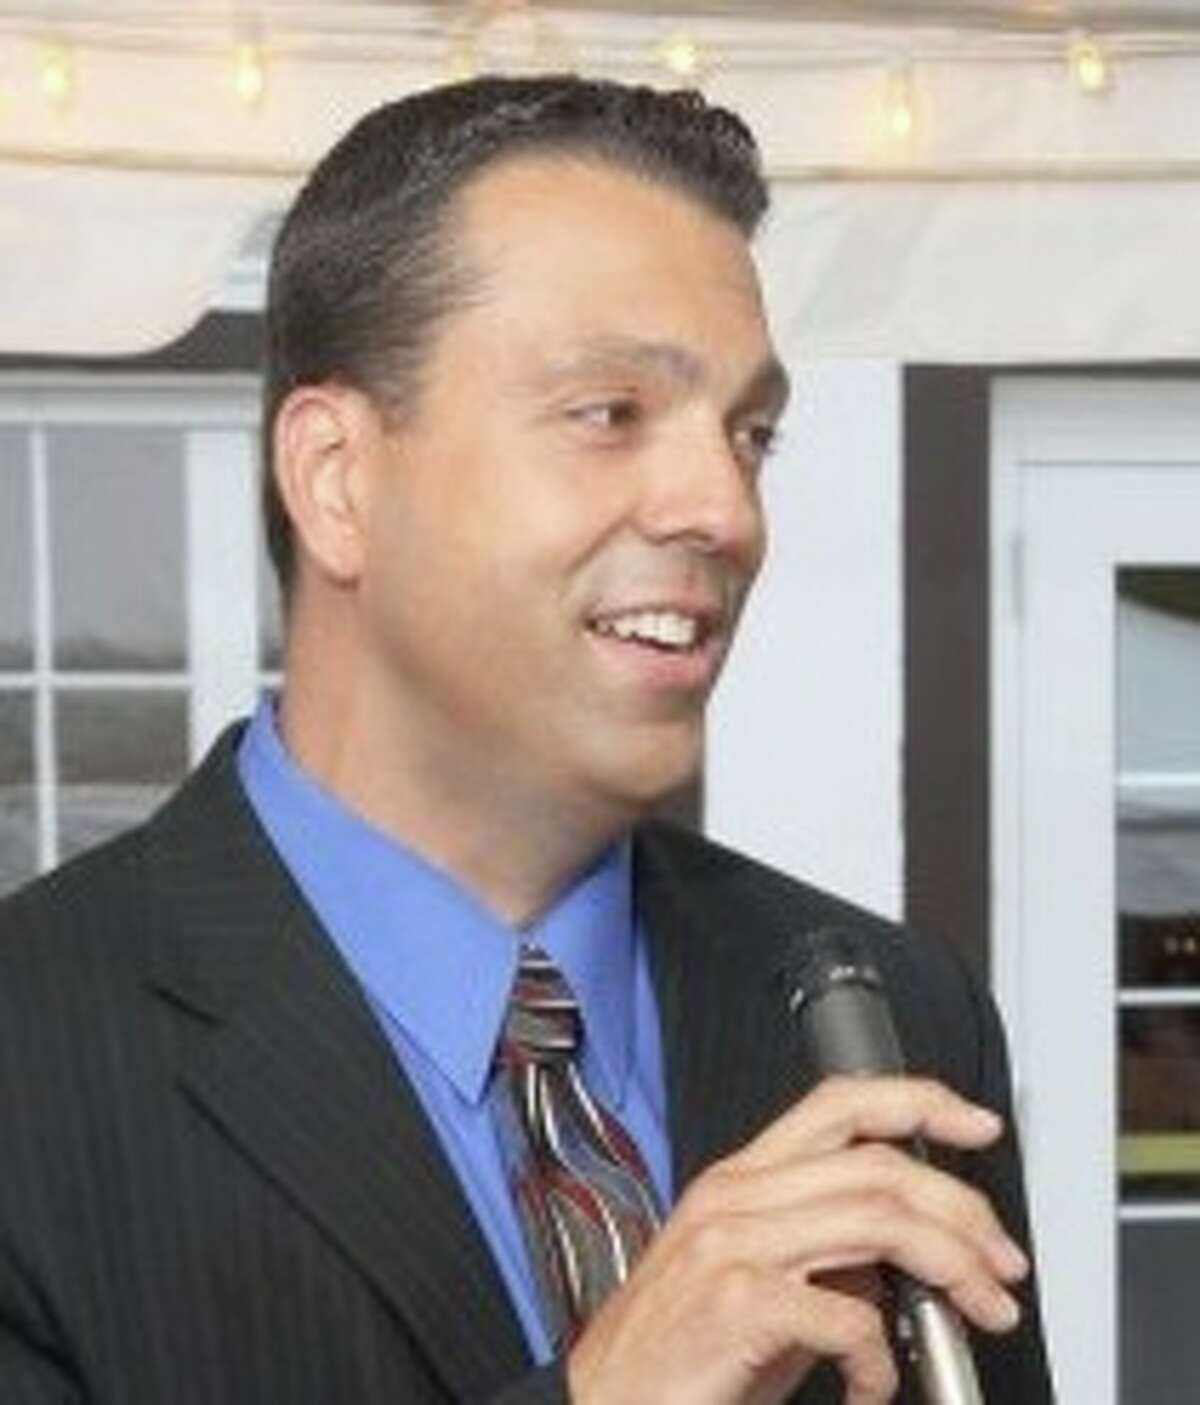 Jerry Gretzinger